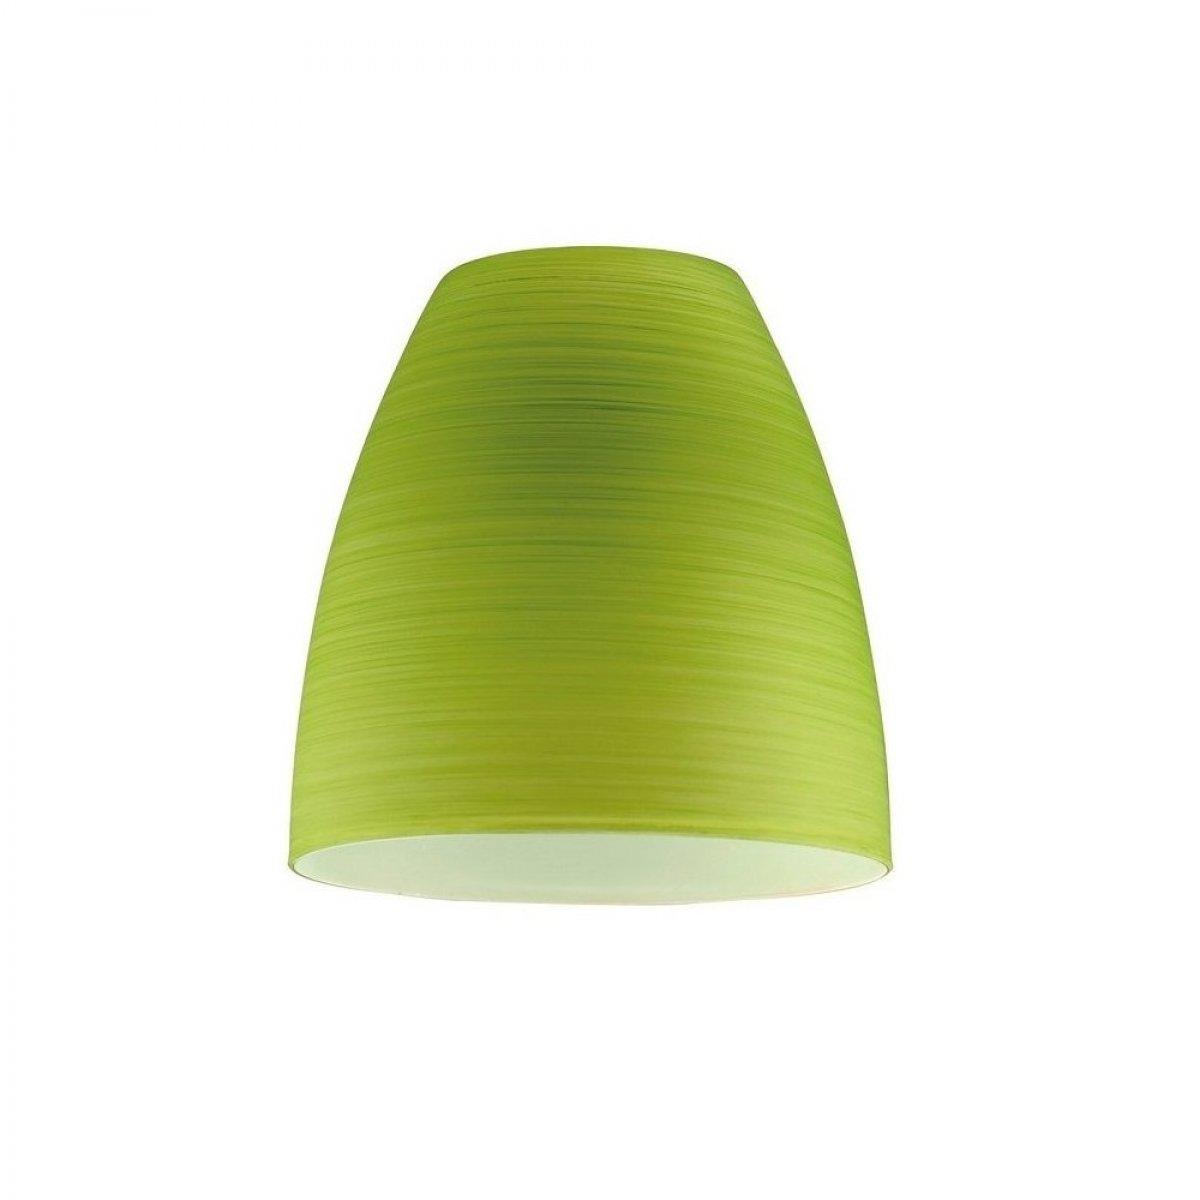 fischer m6 medium1 led no 32050 glas apfelgr n gewischt eur 34 00 leuchten lampen led. Black Bedroom Furniture Sets. Home Design Ideas